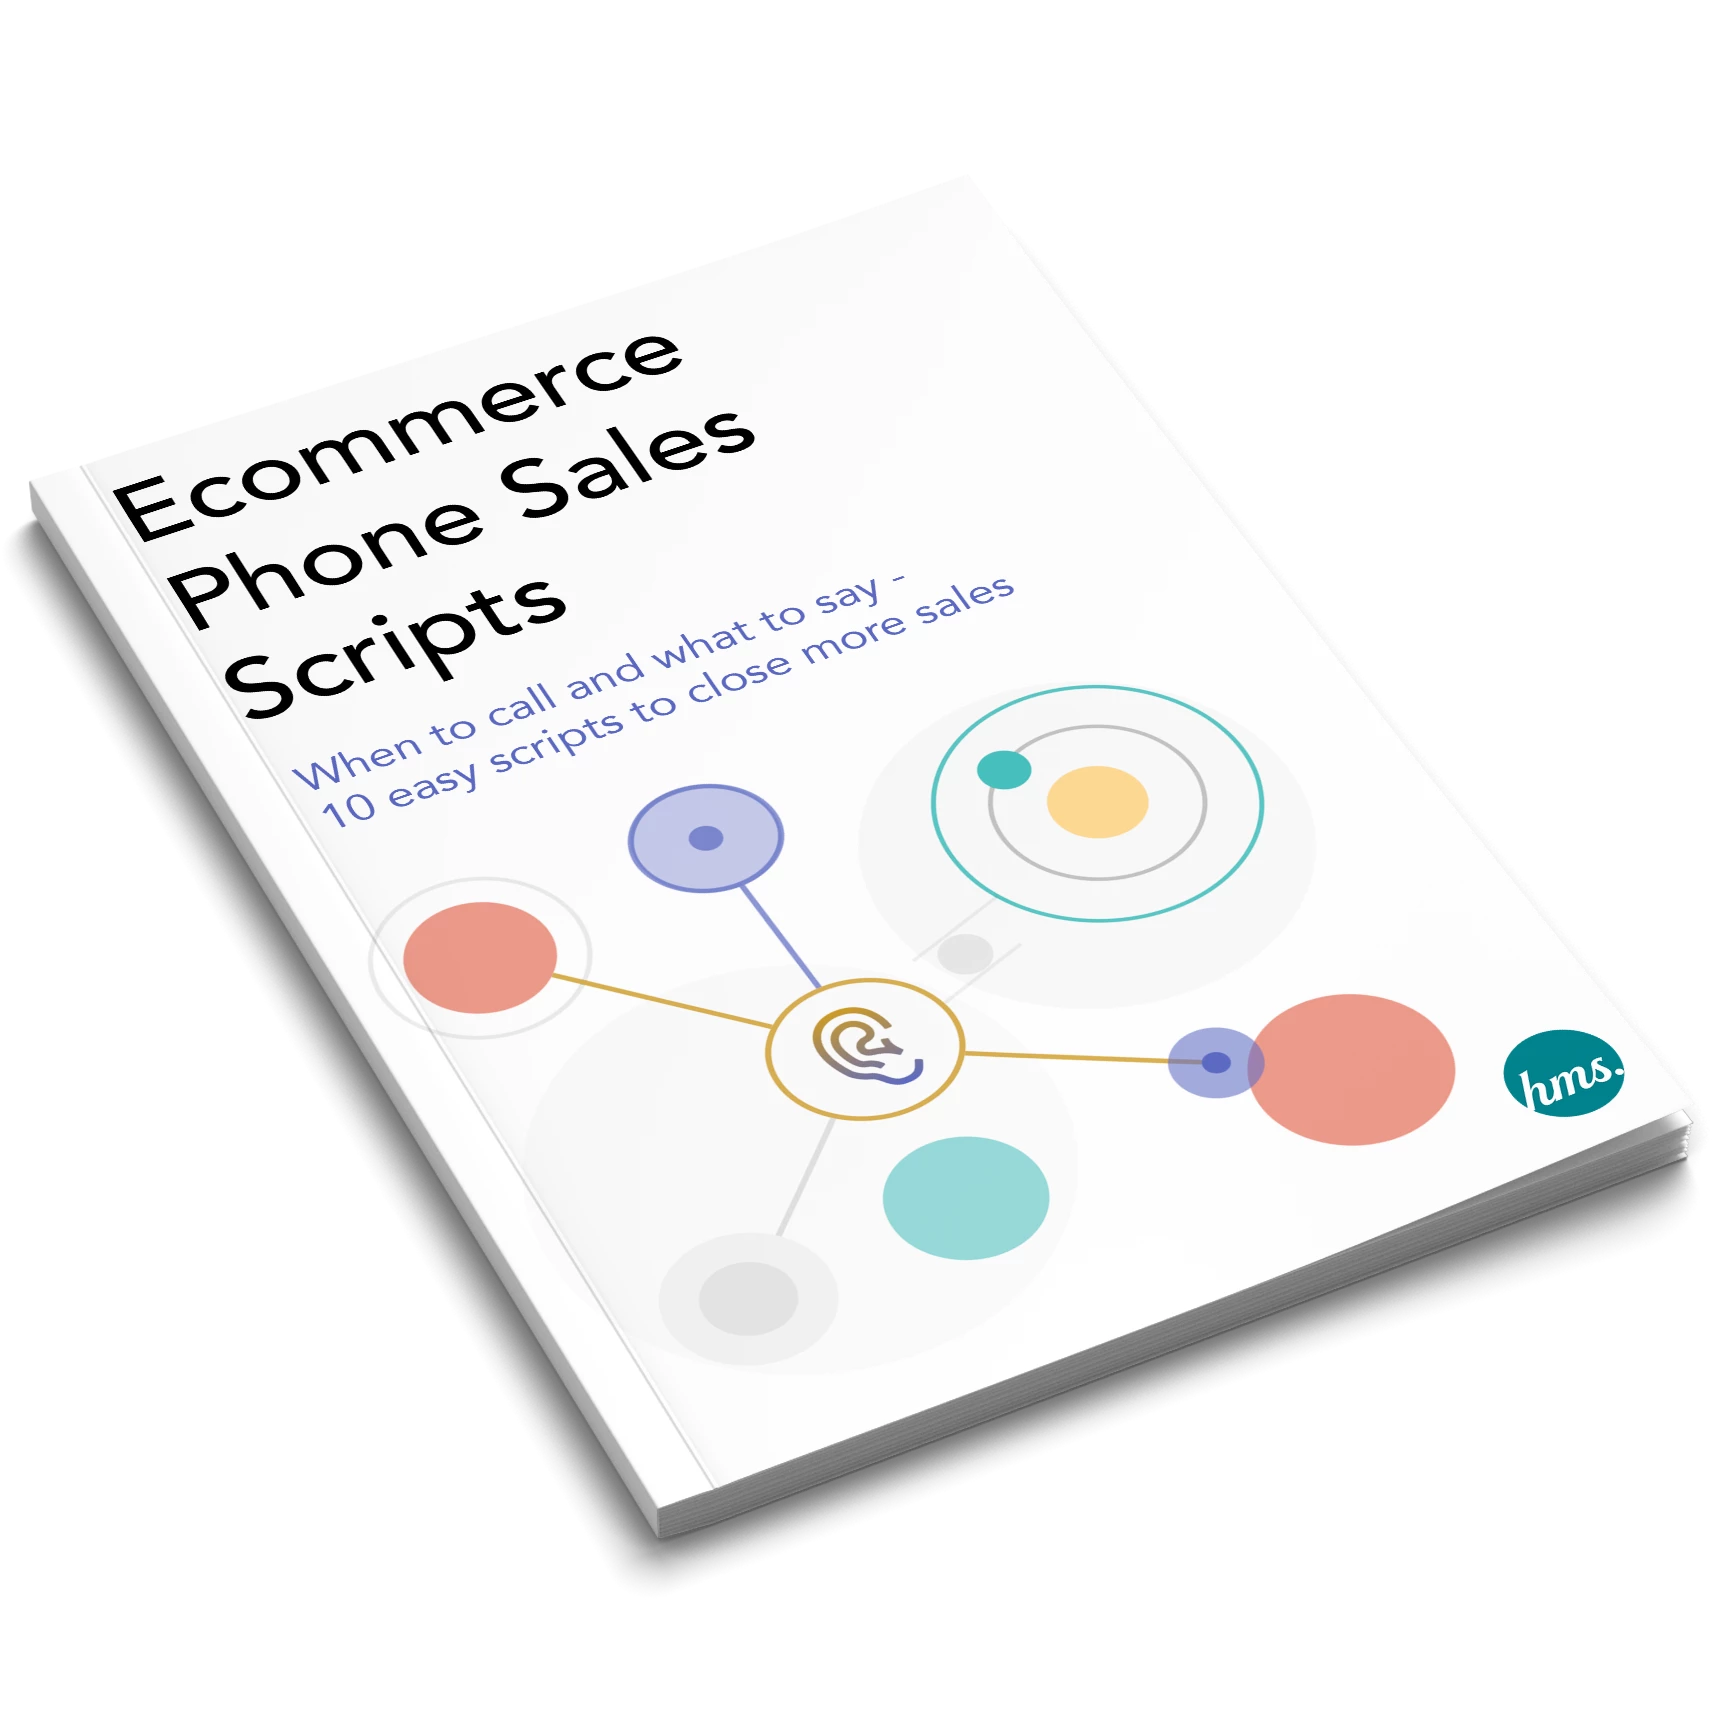 Ecommerce Phone Sales Scripts